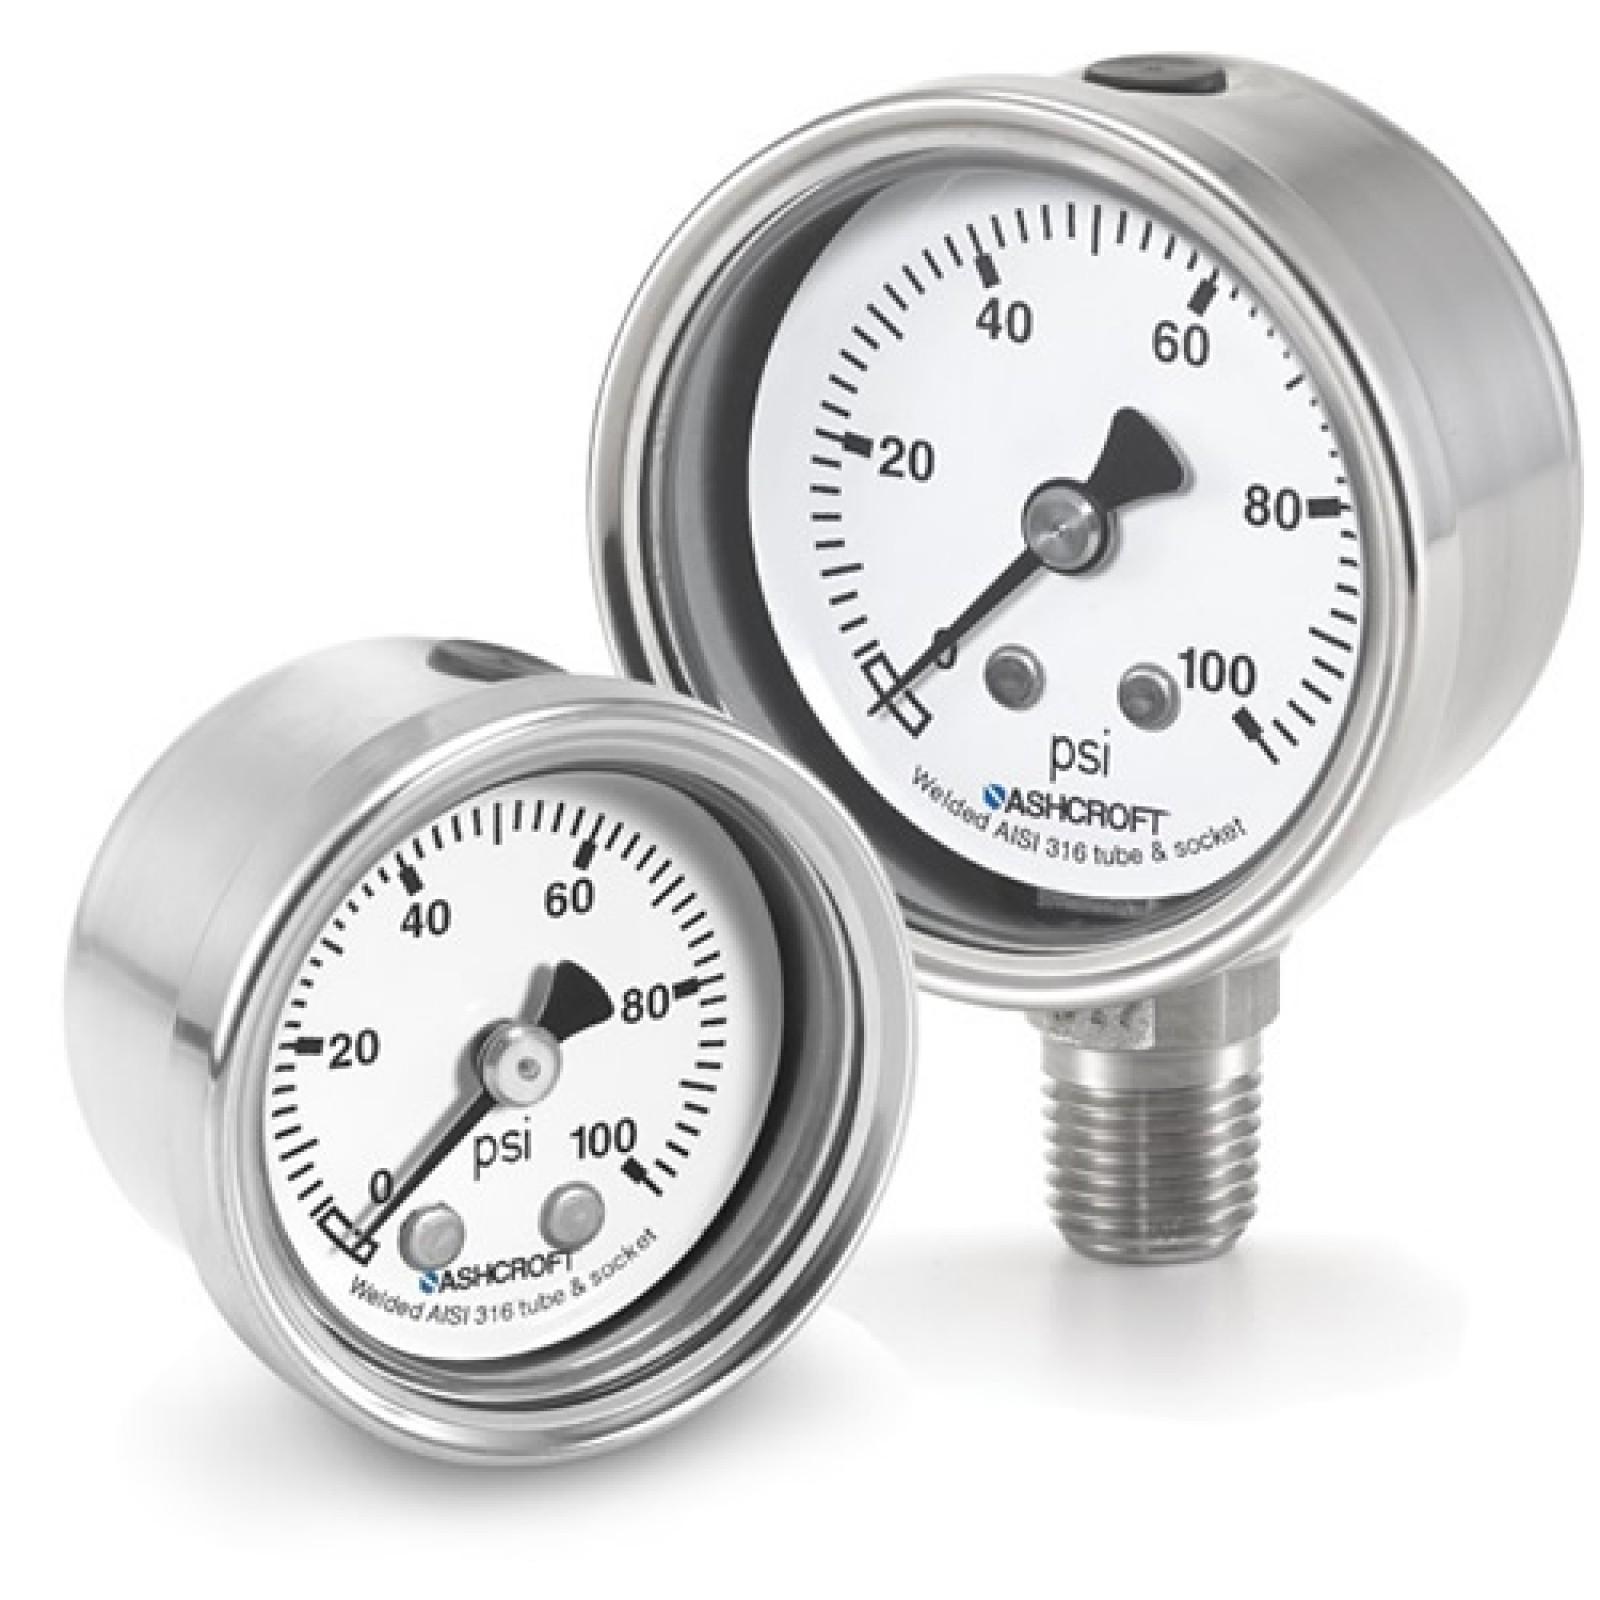 "63 1008S 02L XLL 30#/KP - Pressure Gauge, 63mm stainless 1/4"" NPT Lower conn & Case, Plus Performance 0/30 psi"